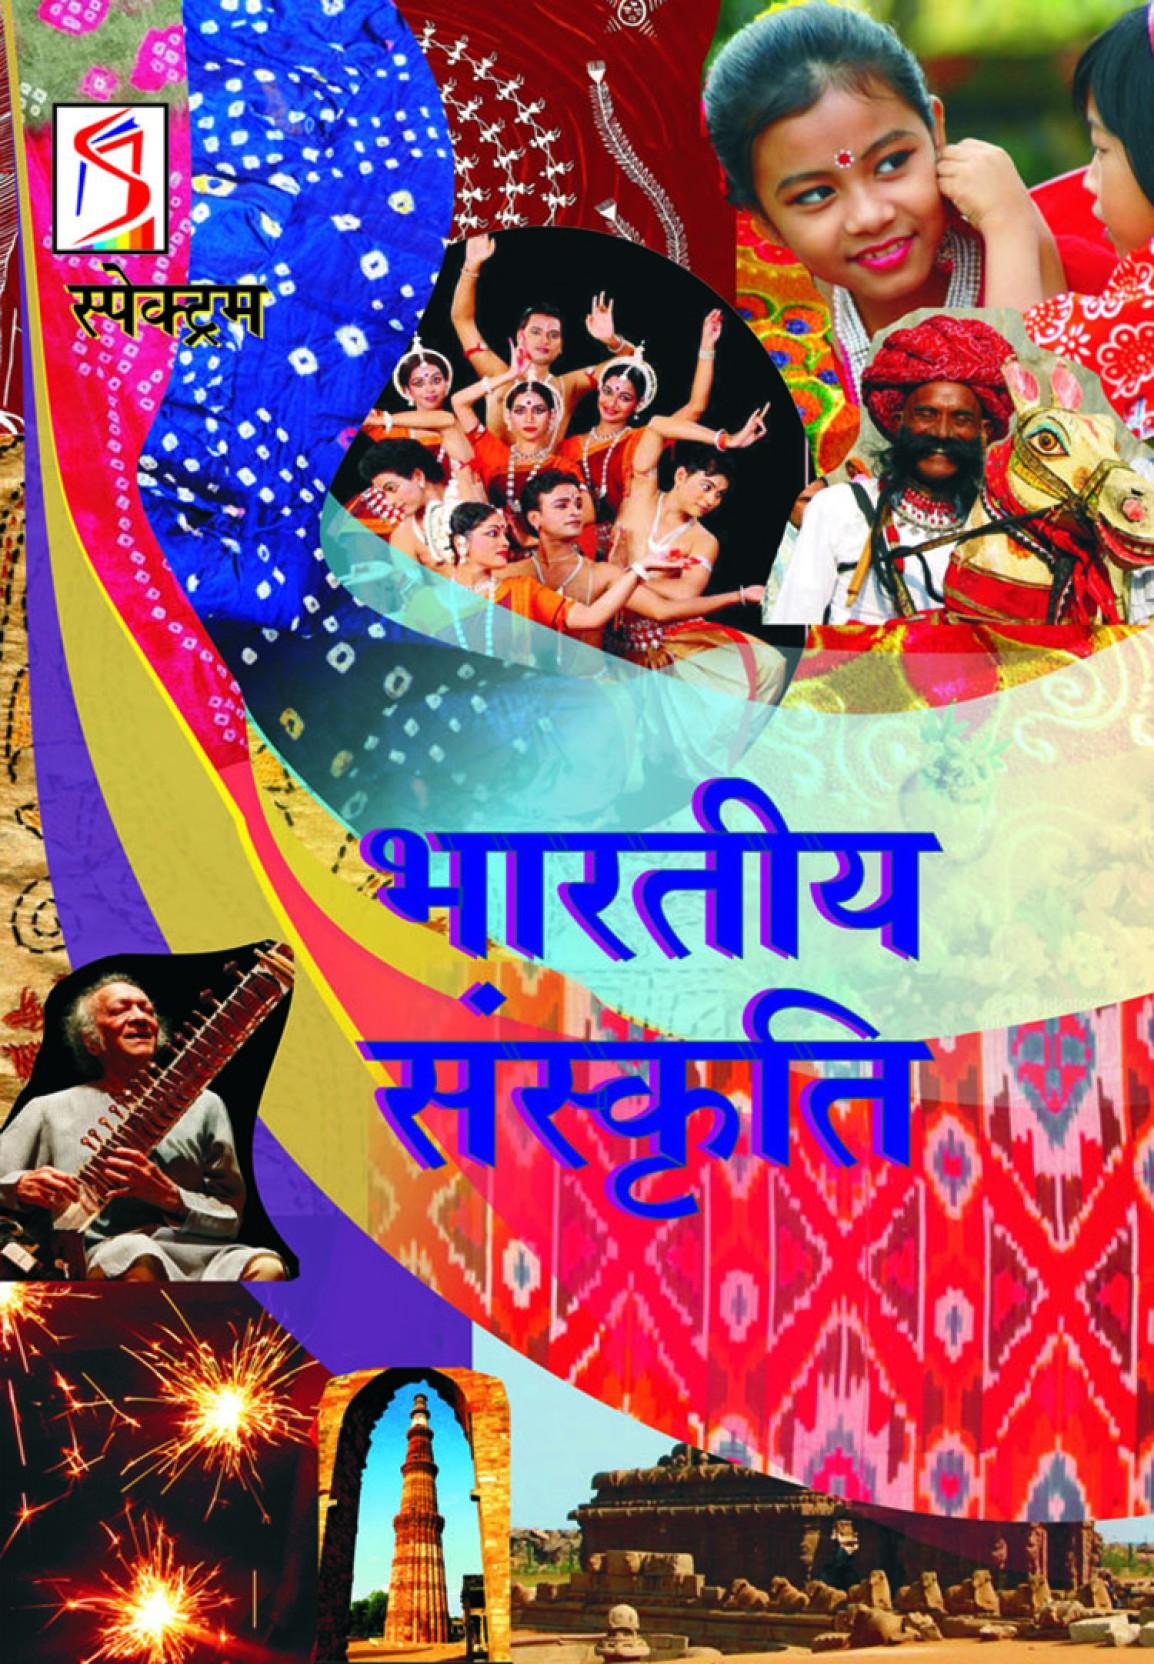 bhartiya sanskriti par essay भारतीय संस्कृति hindi essay on bhartiya sanskriti december 17, 2015 admingeek.